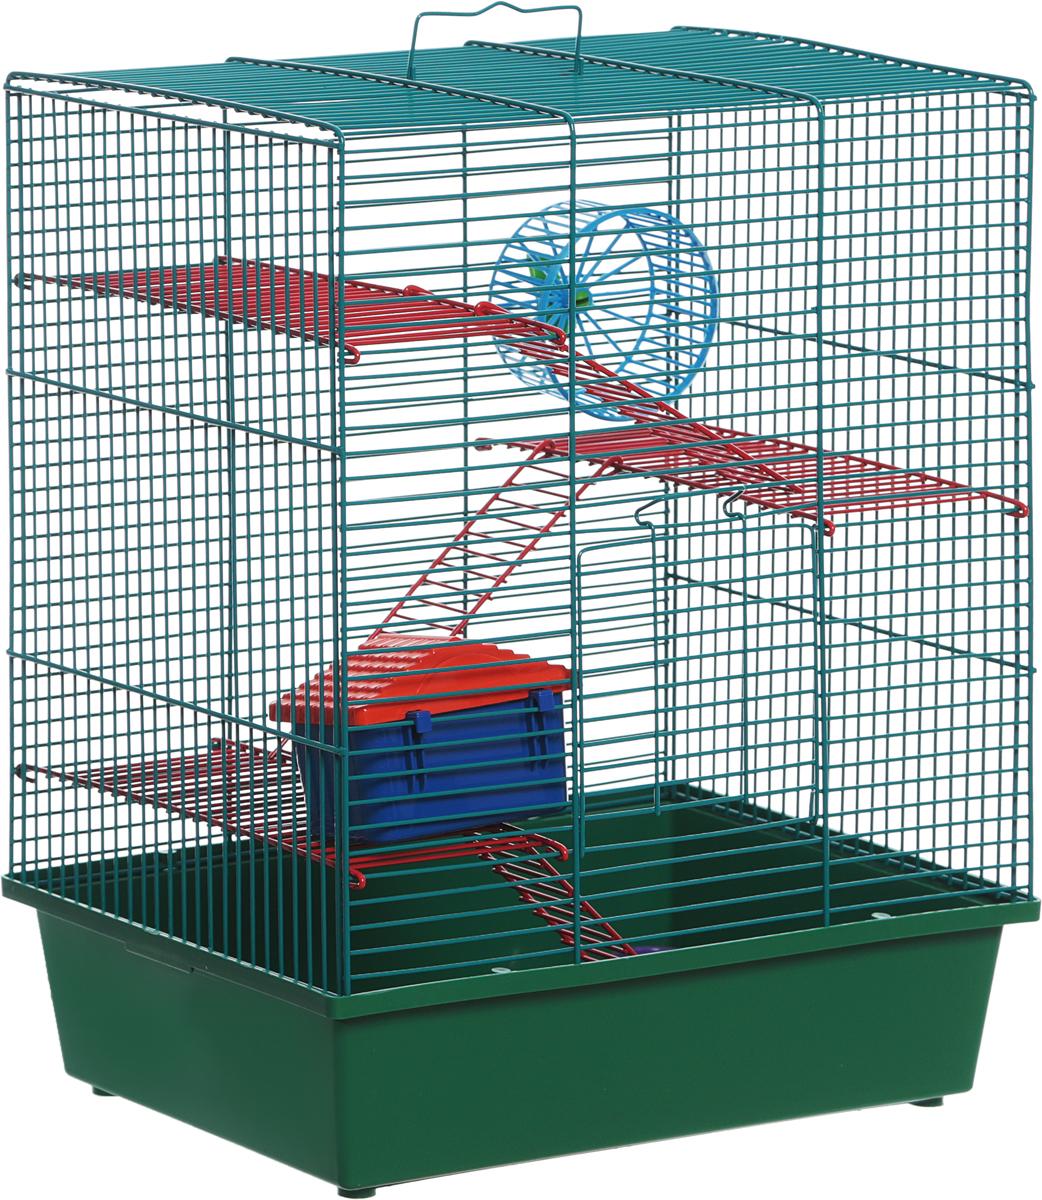 Клетка для грызунов Велес Lusy Hamster-4, 4-этажная, цвет: зеленый, 35 х 26 х 45 см клетка для грызунов ferplast hamster duo белая 46x29x37 5см